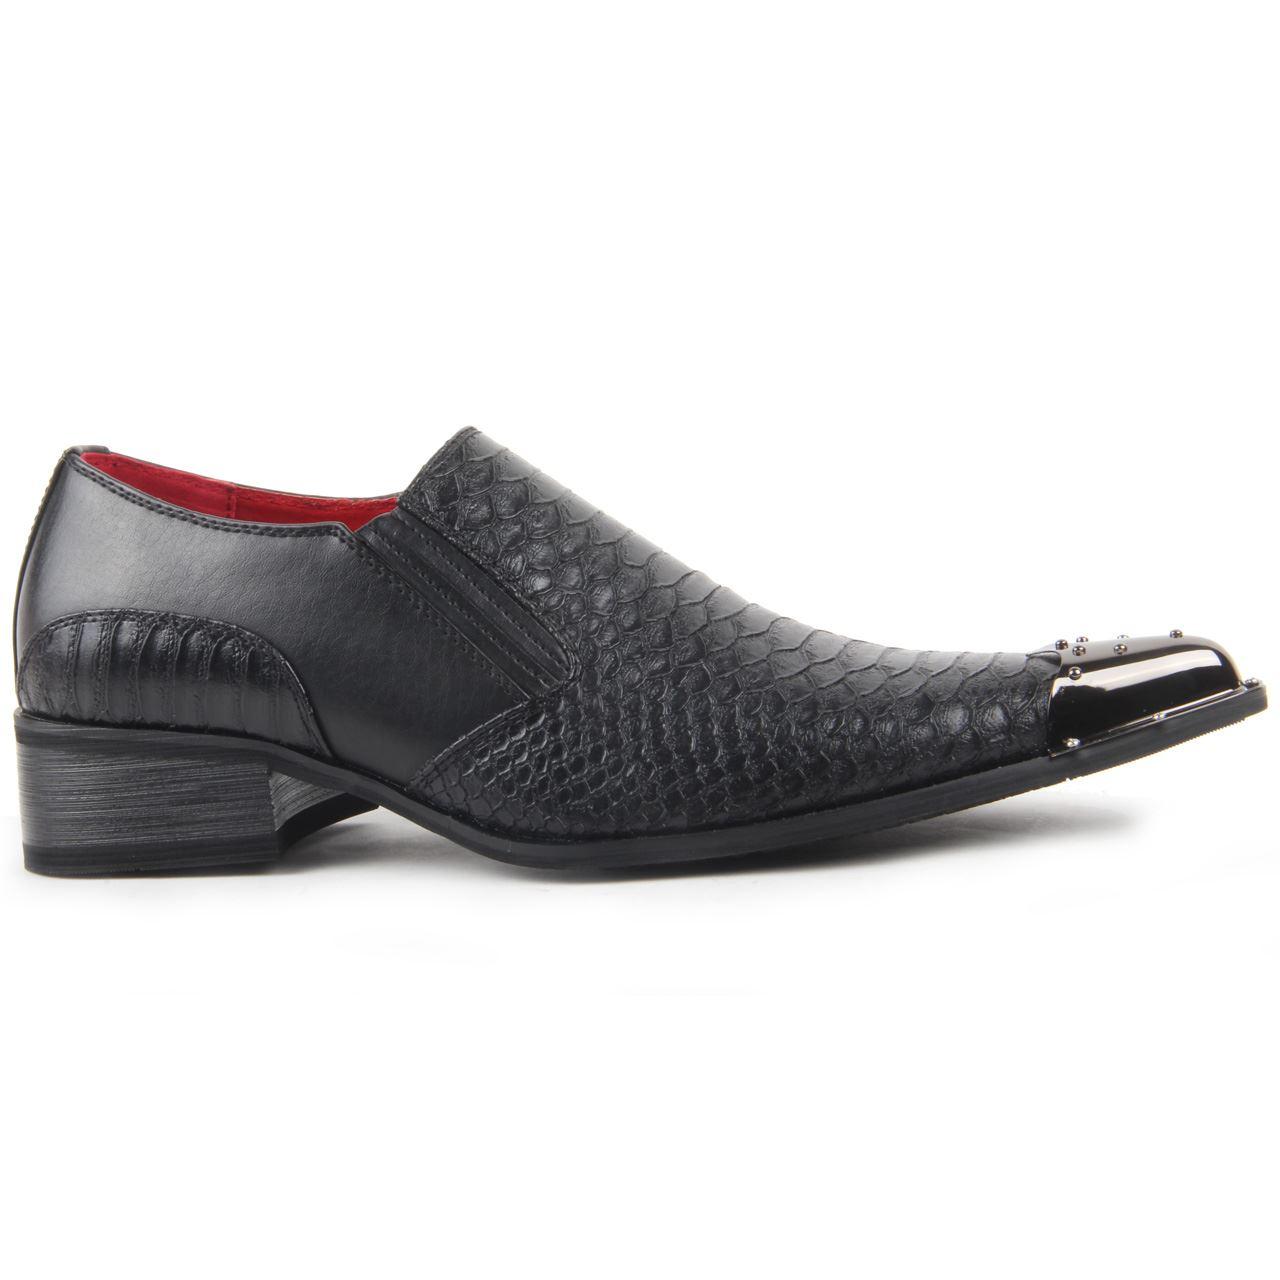 Croc Skin Mens Shoes